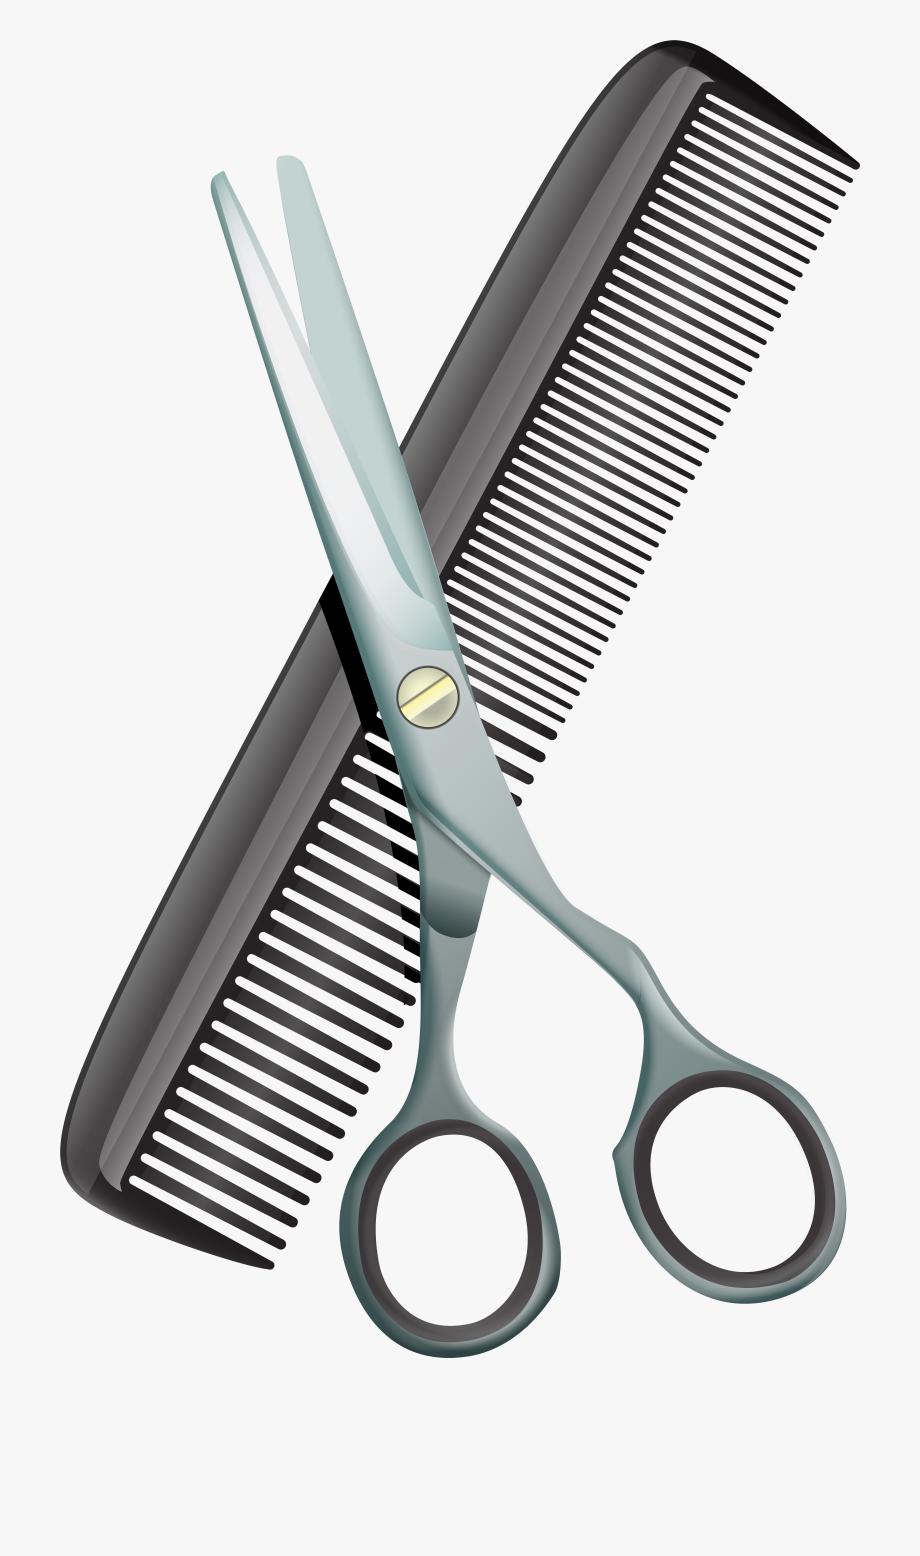 Shears Clipart Comb.